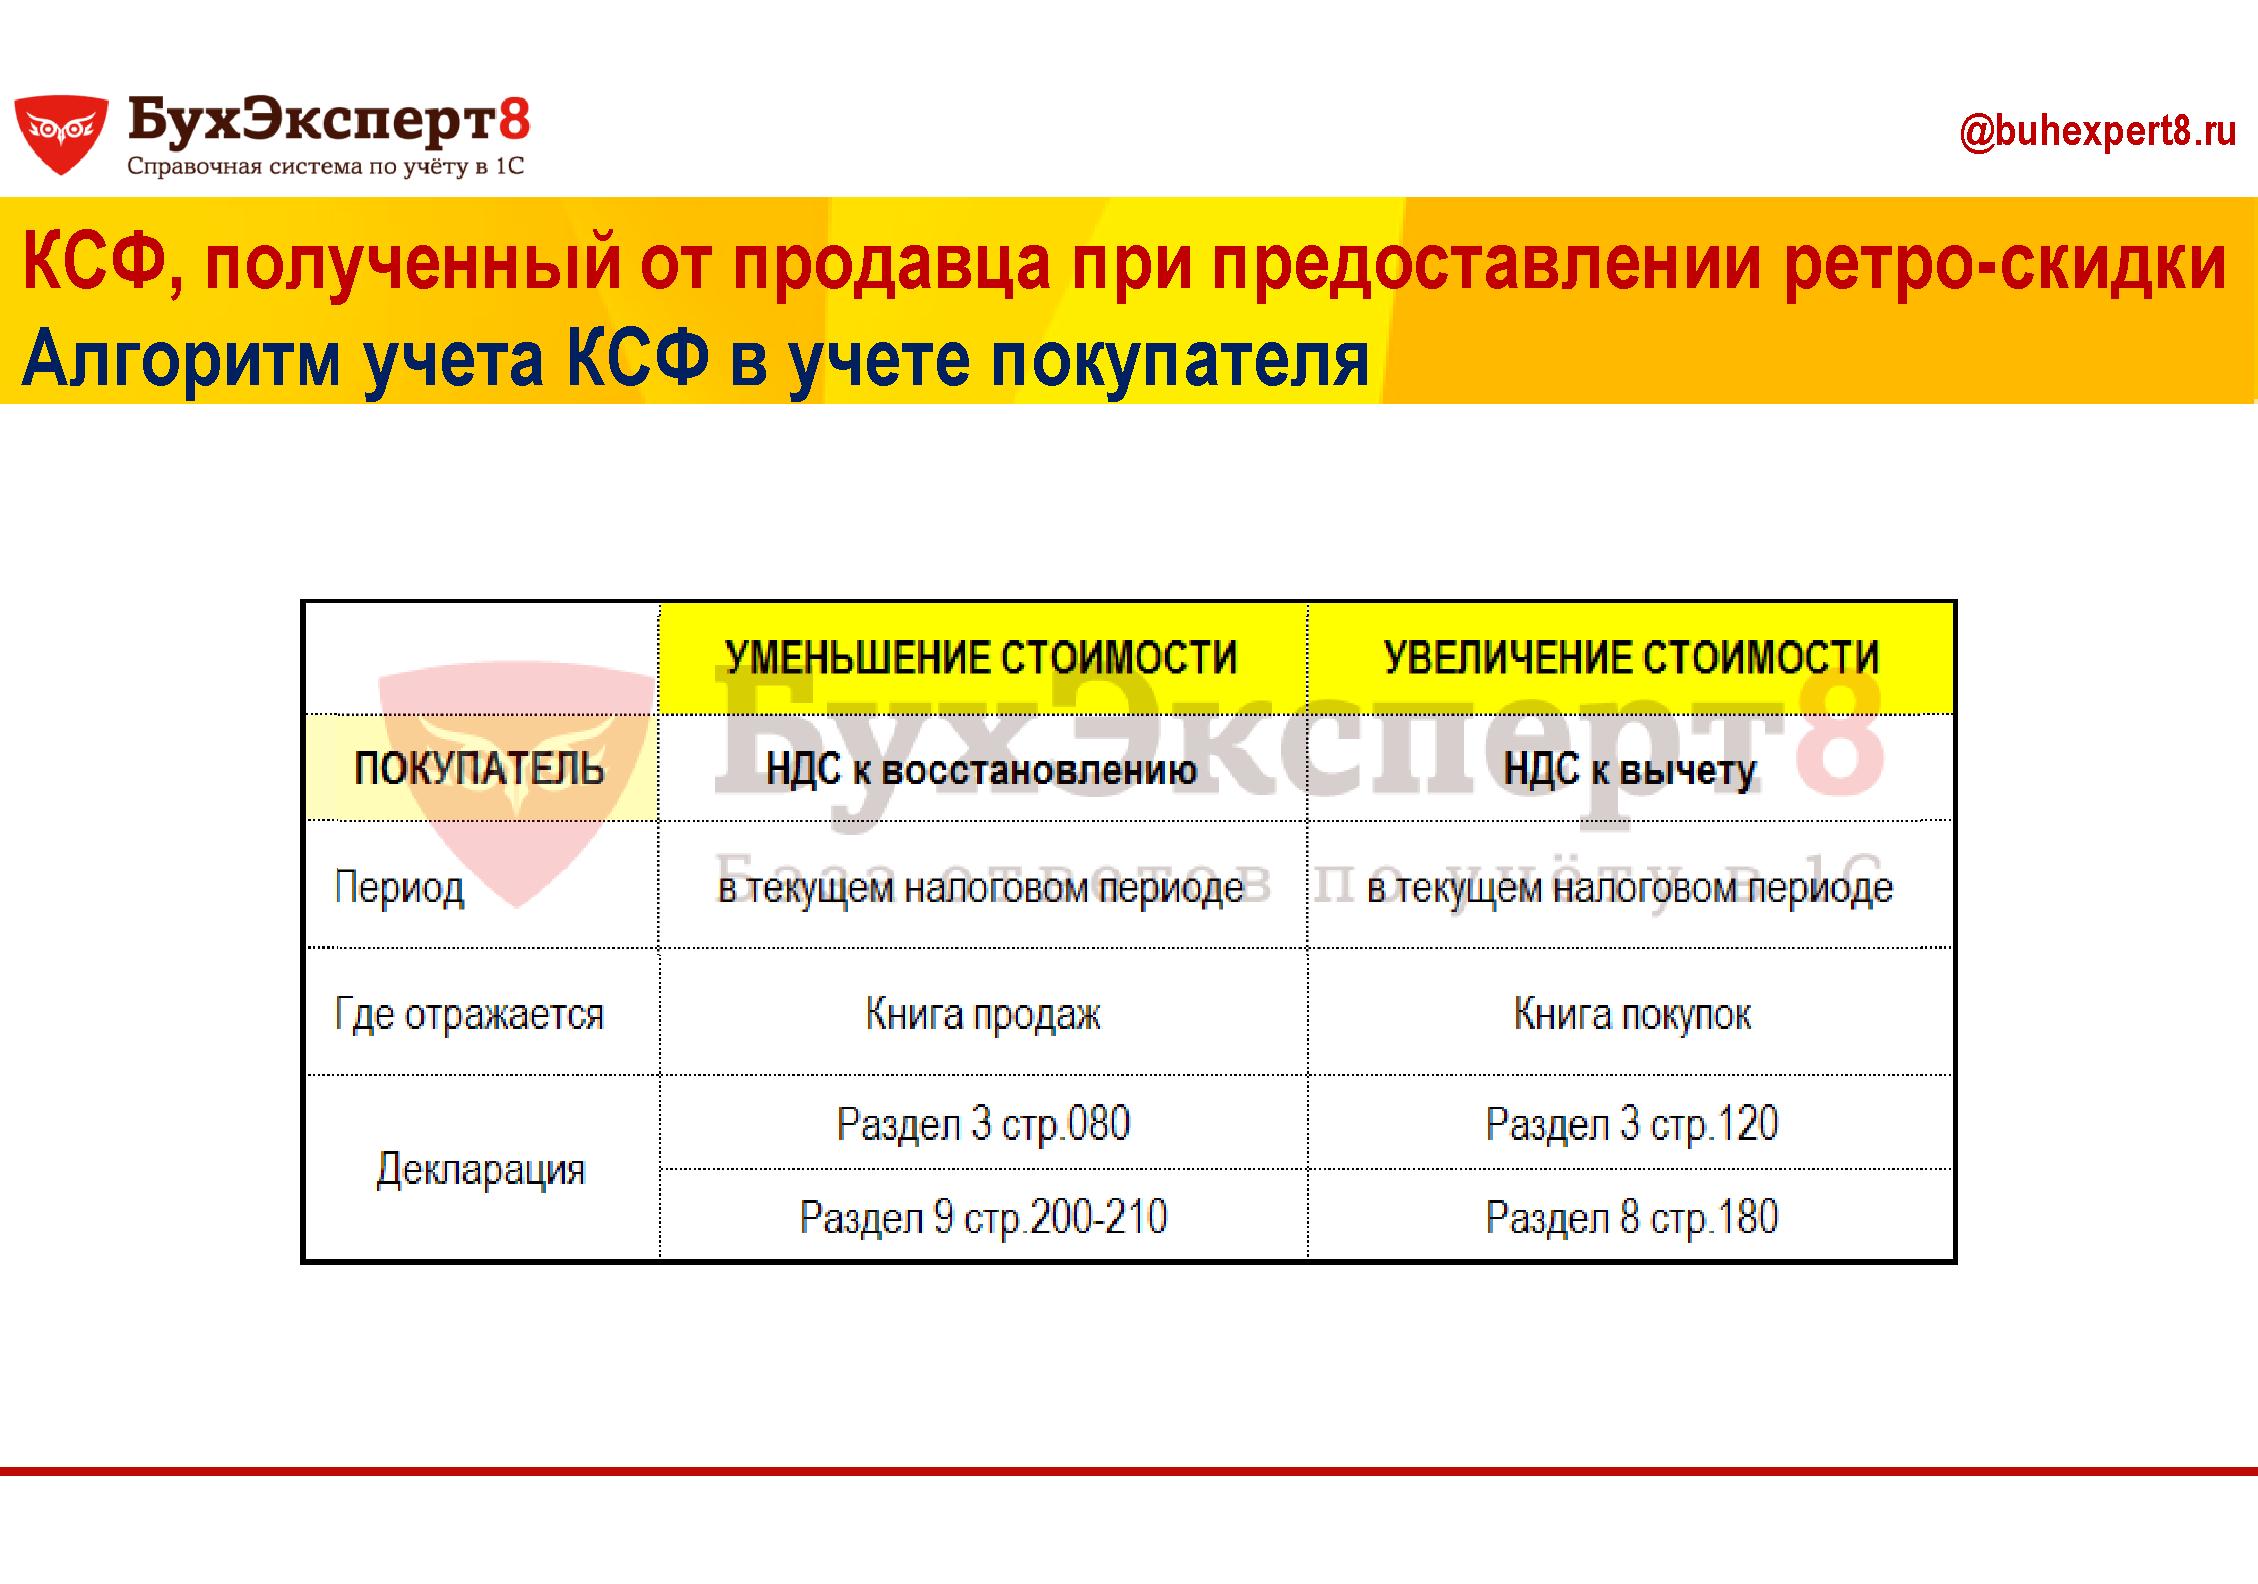 КСФ, полученный от продавца при предоставлении ретро-скидки Алгоритм учета КСФ в учете покупателя